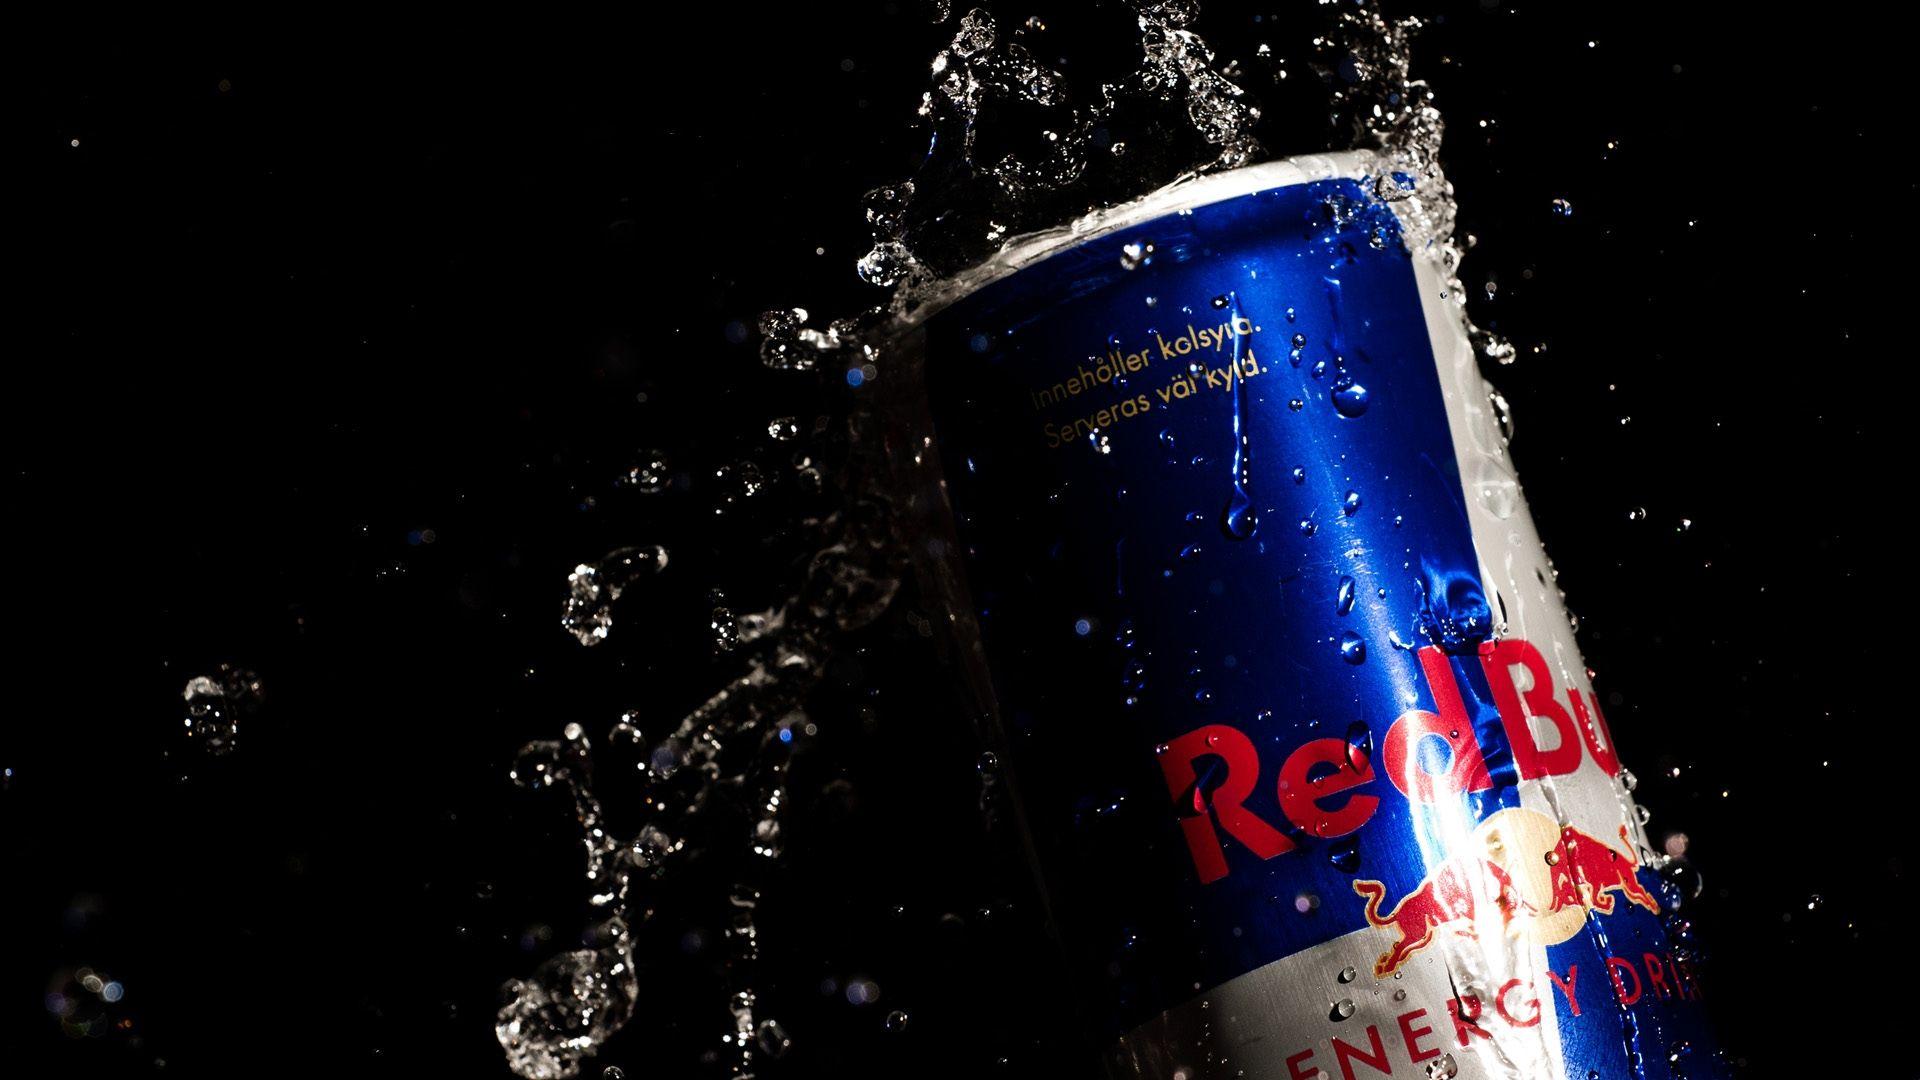 Red Bull Red Bull F1 Racing Red Bull Racing